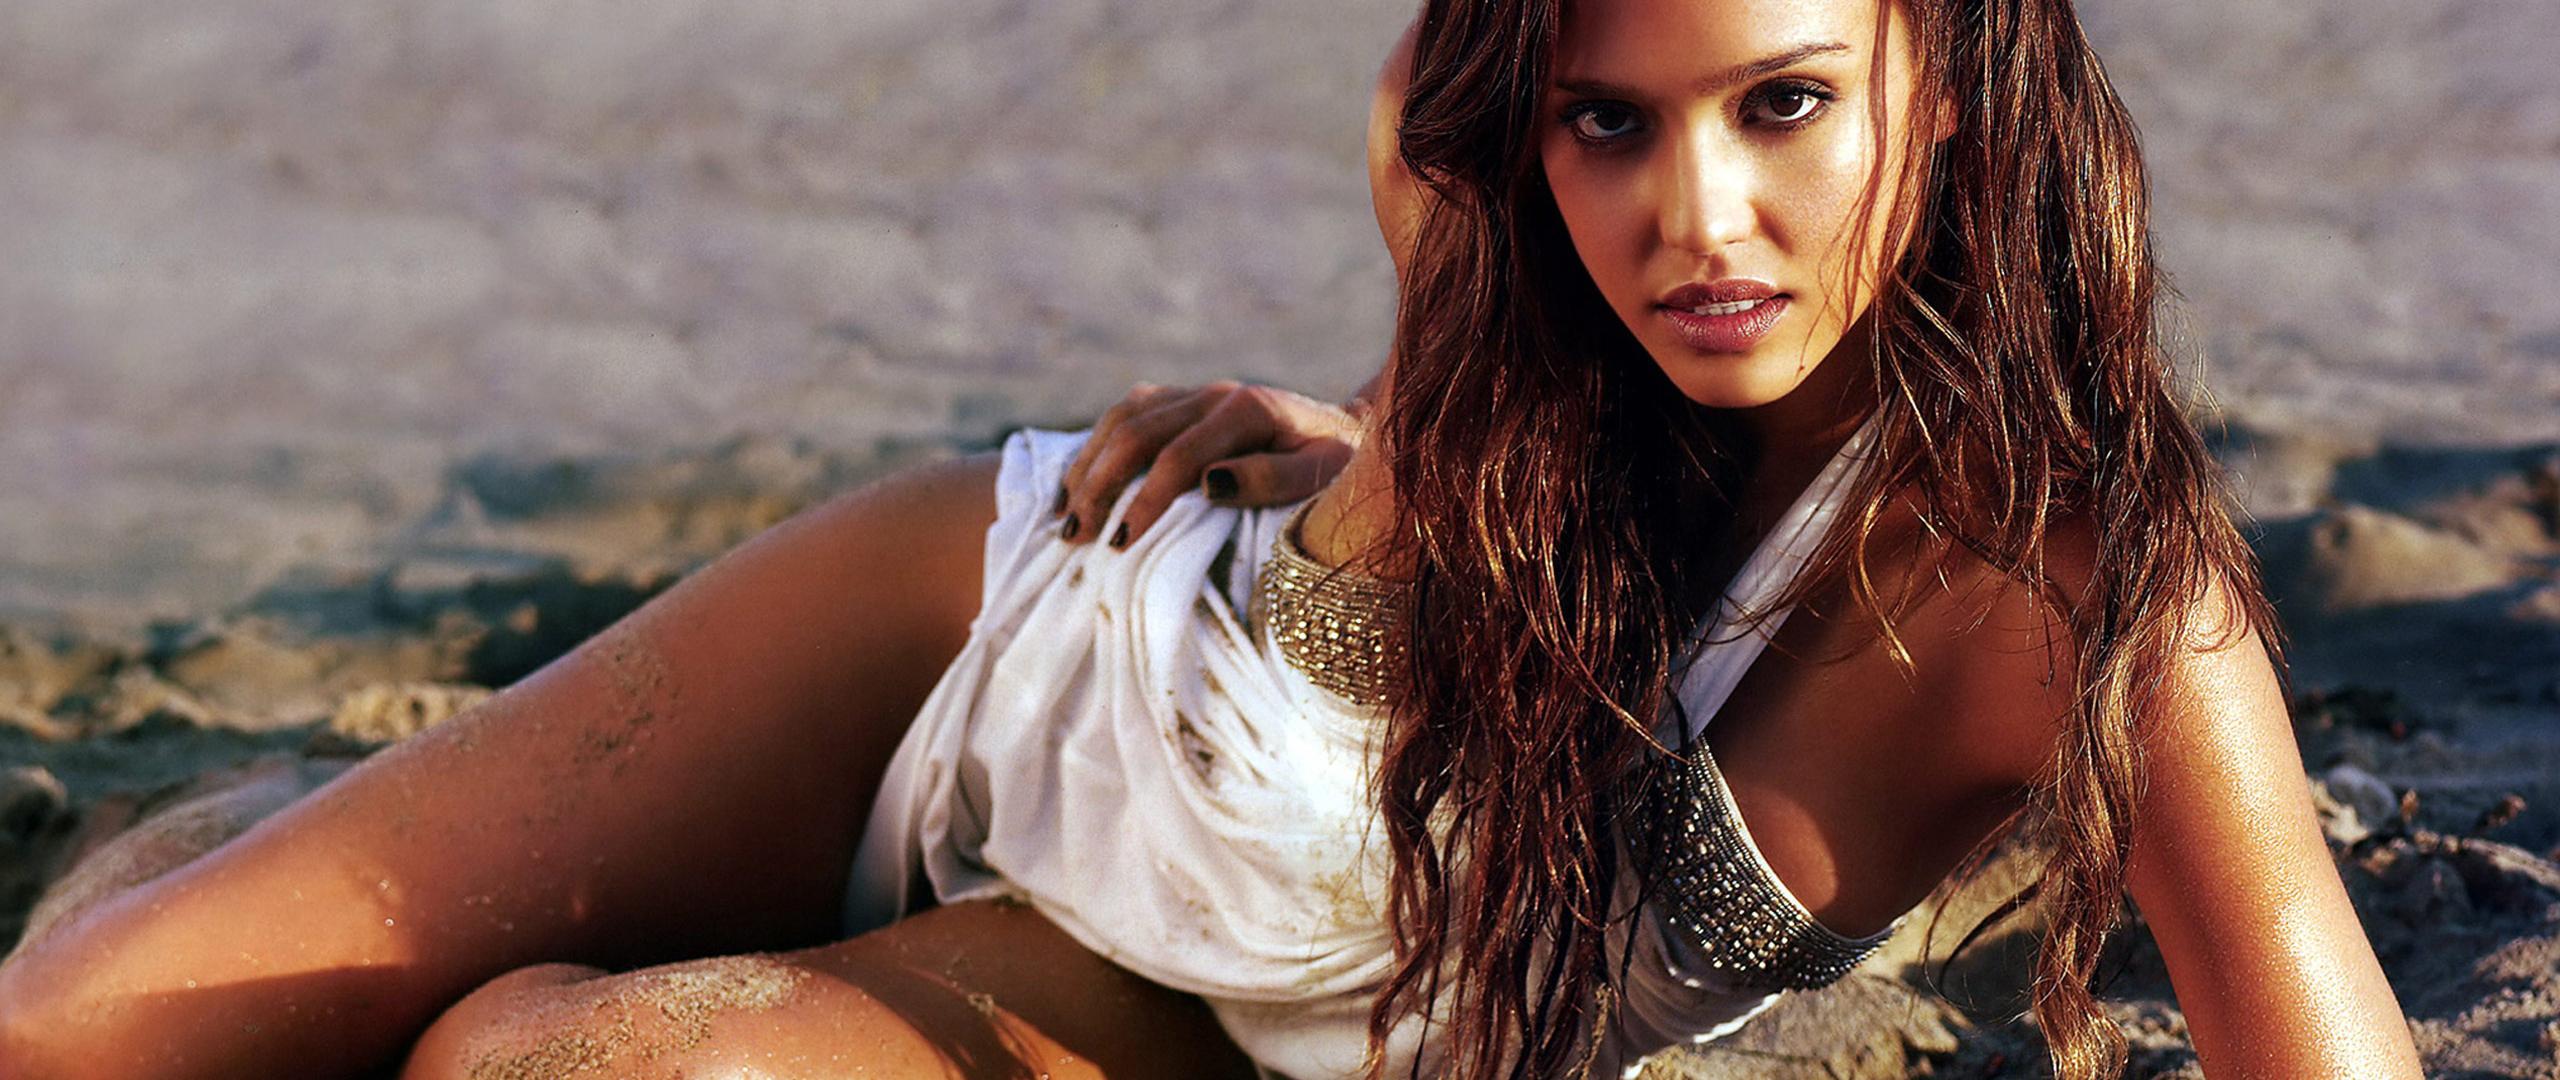 Wallpaper jessica alba hot Jessica Alba